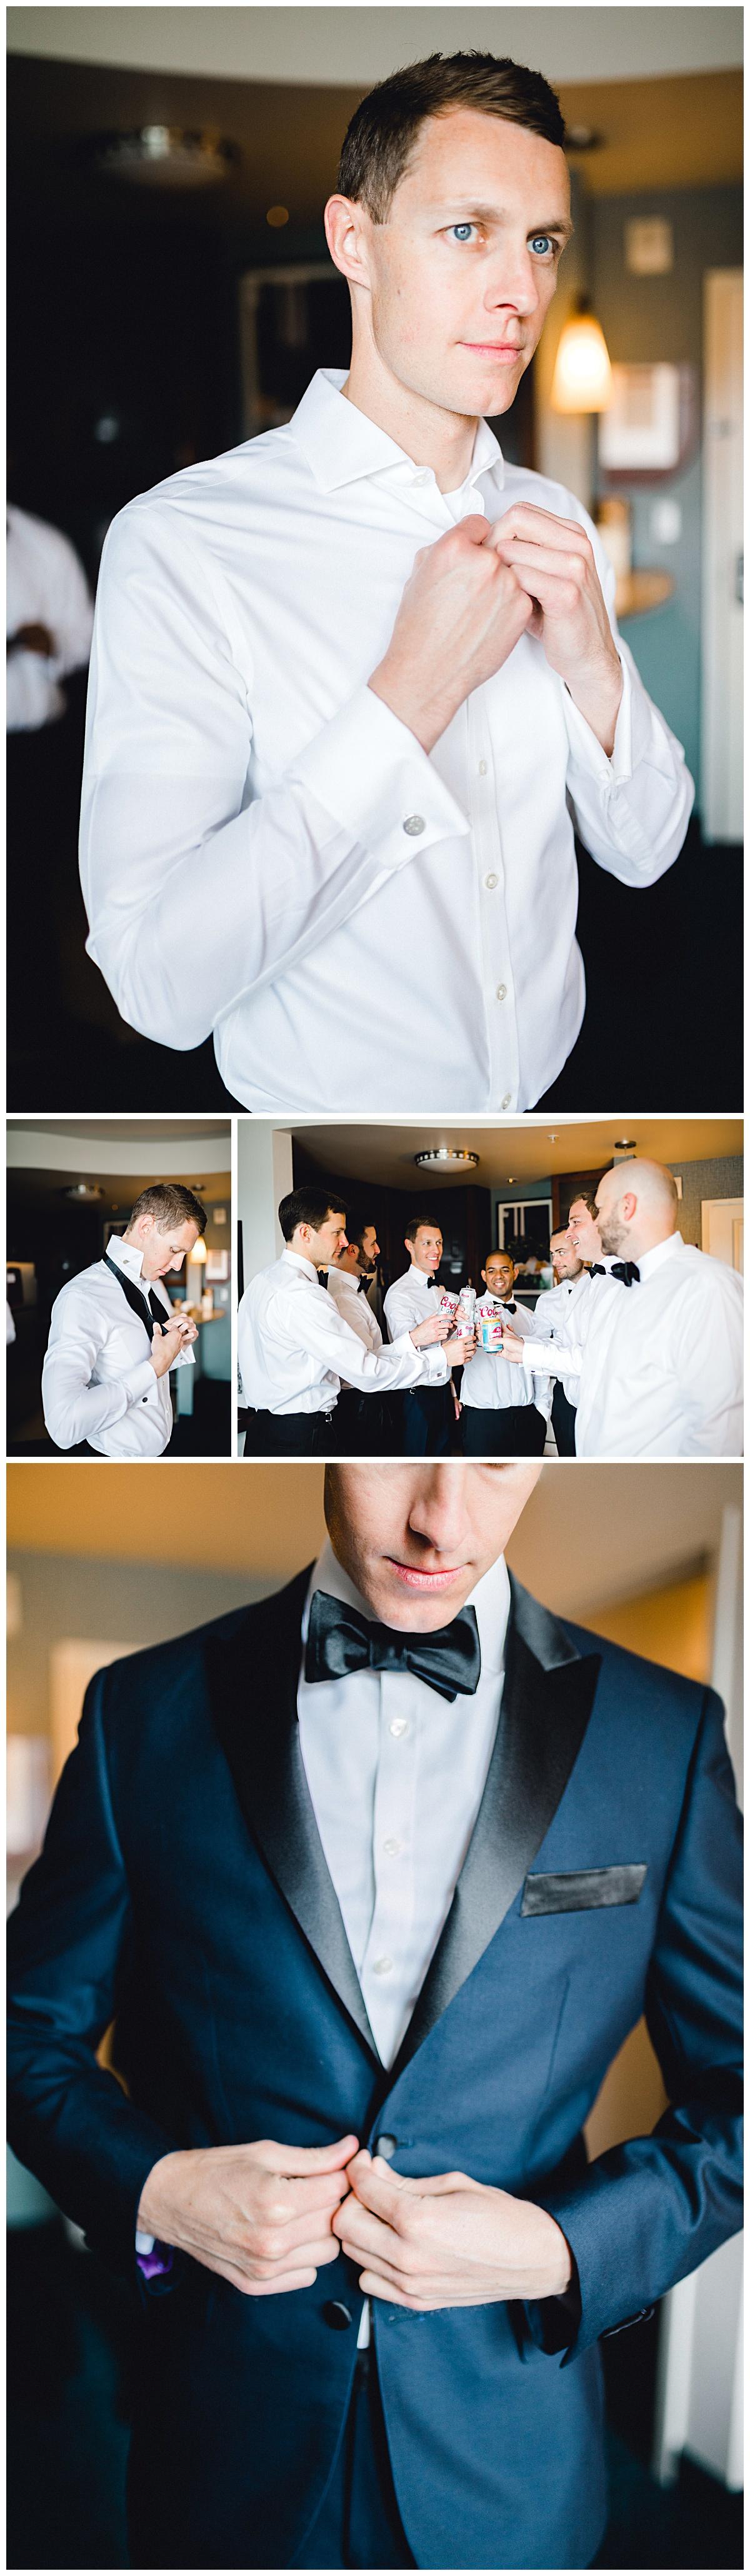 emily and matt's wedding cincinnati ohio chapel lane photography 2